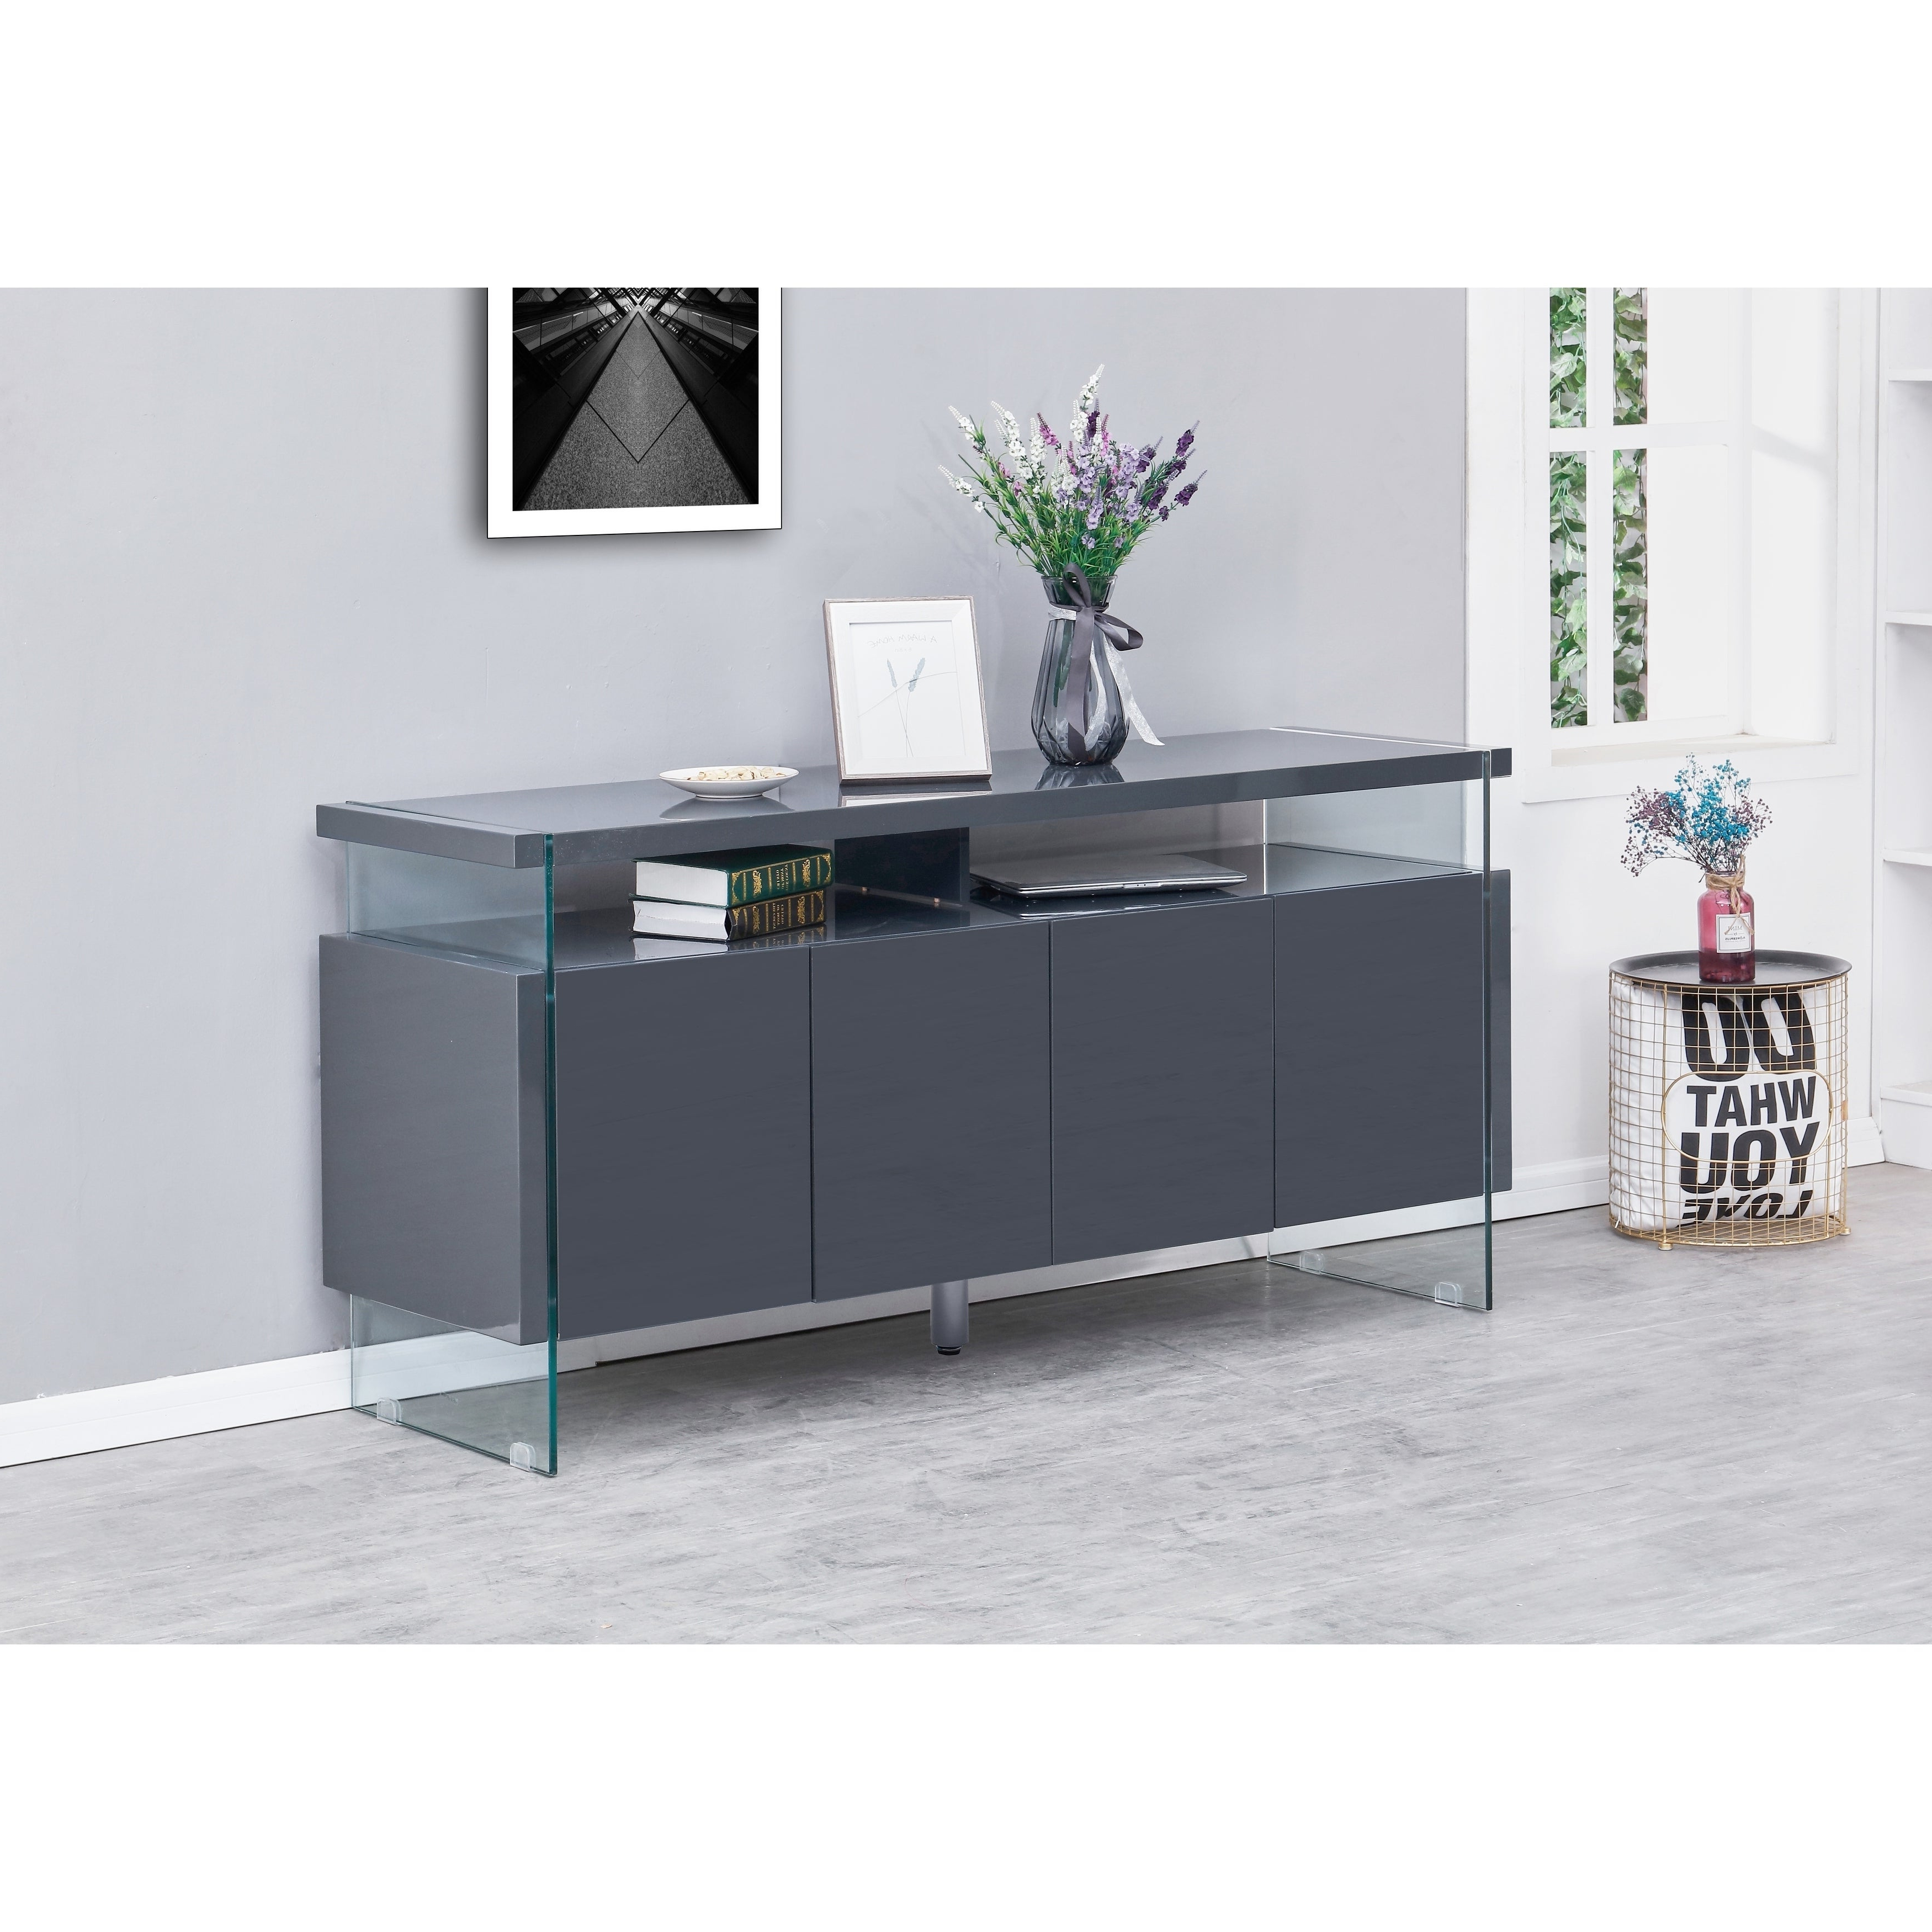 Best Quality Furniture 4 Door Lacquer Buffet Server Regarding 4 Door Lacquer Buffets (View 5 of 20)